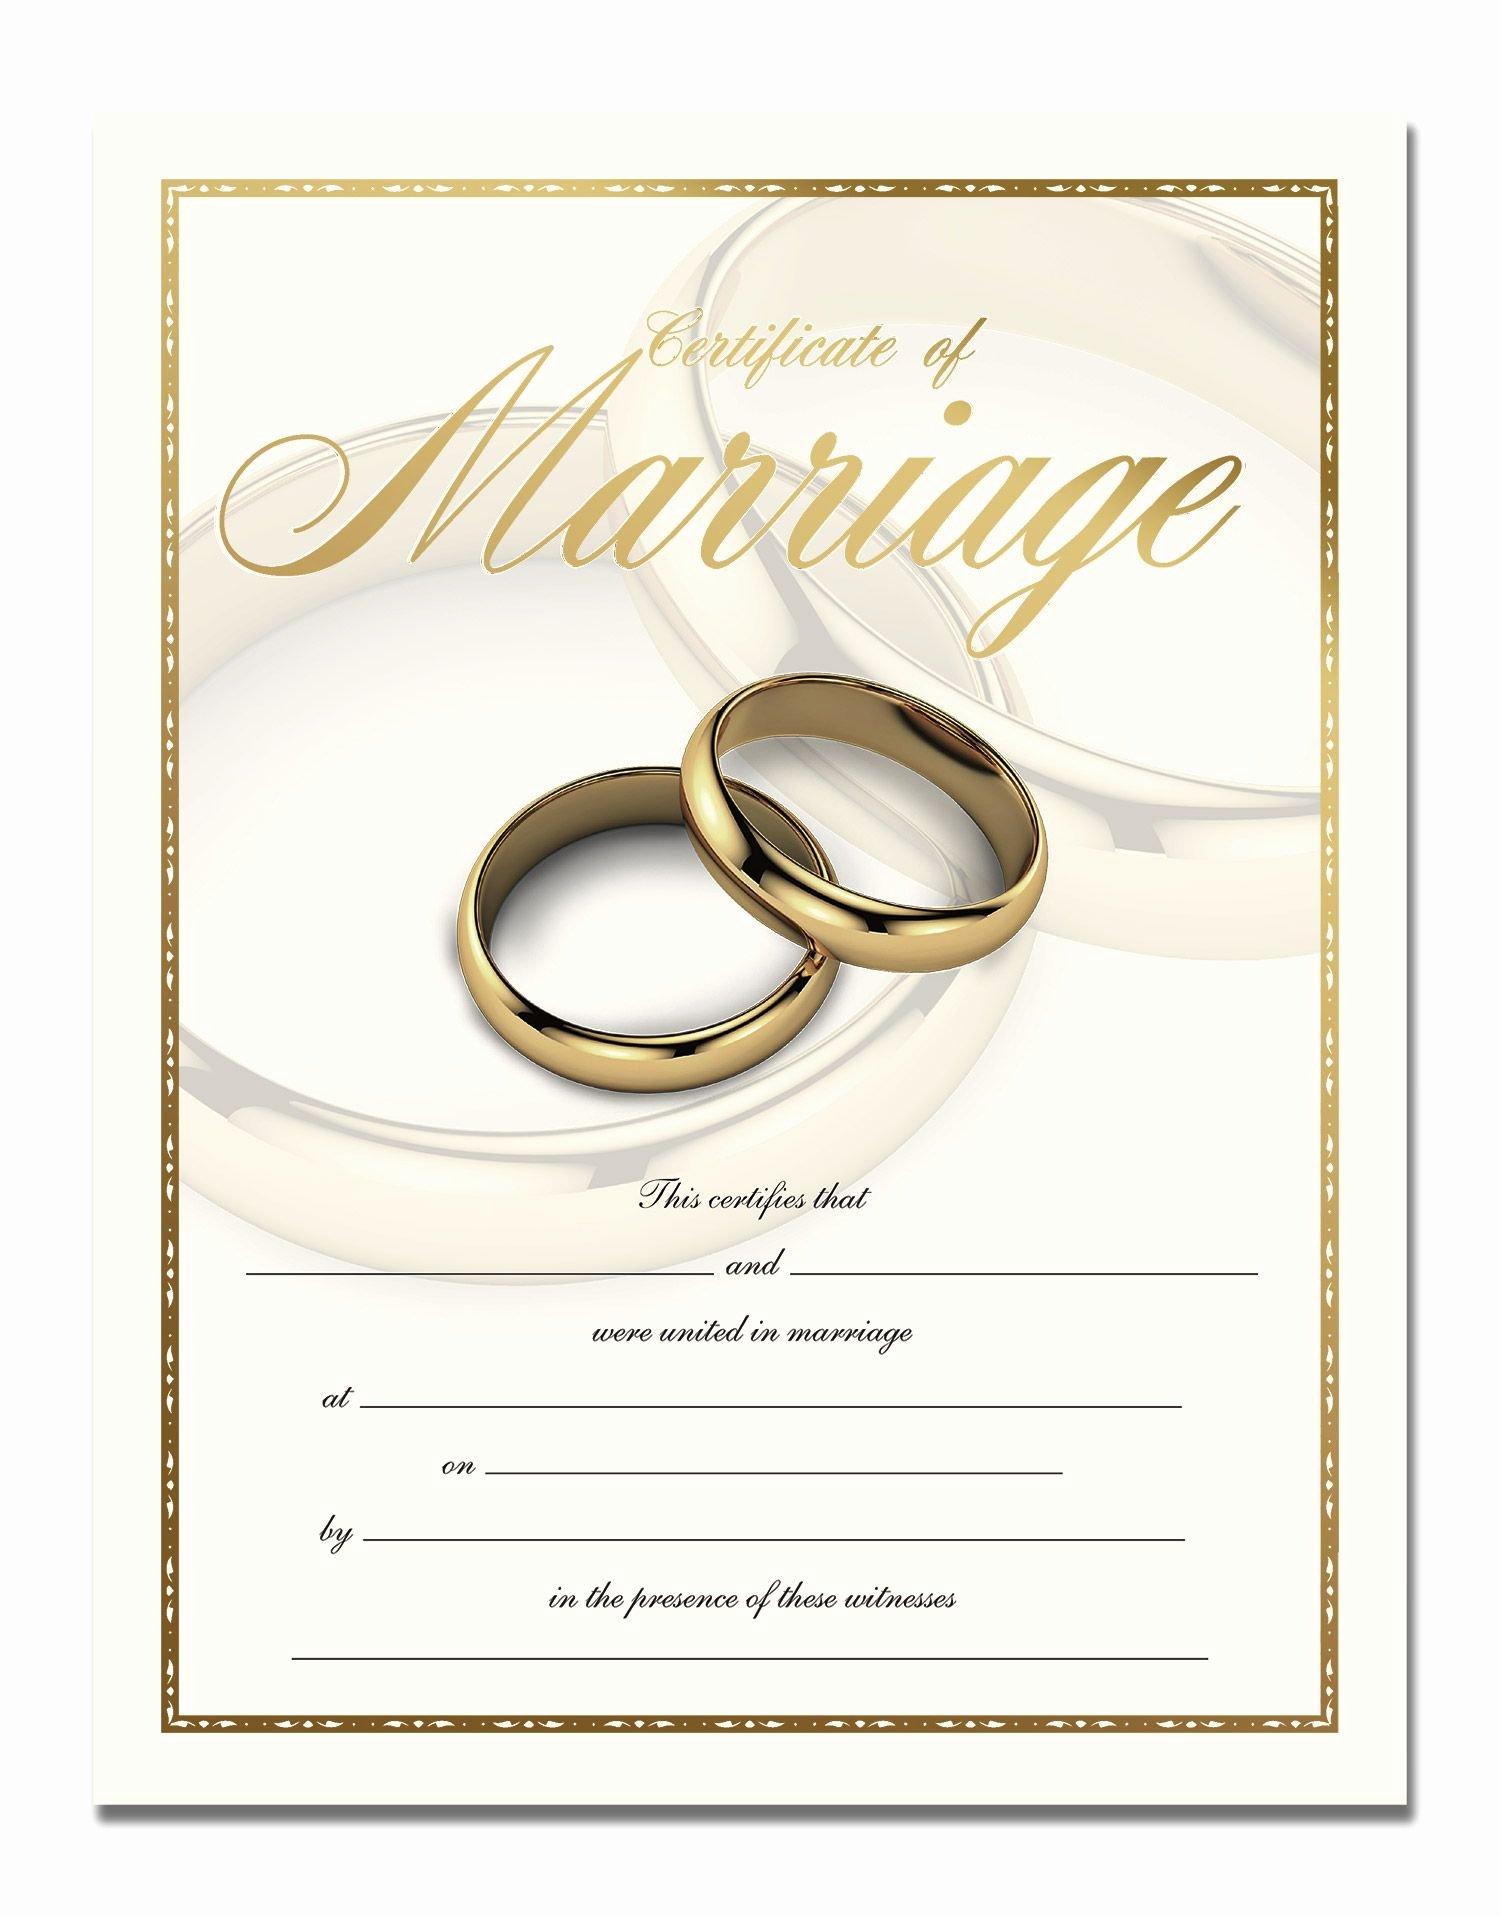 Marriage Covenant Certificate Template Beautiful Premium Certificate Of Marriage In 2019